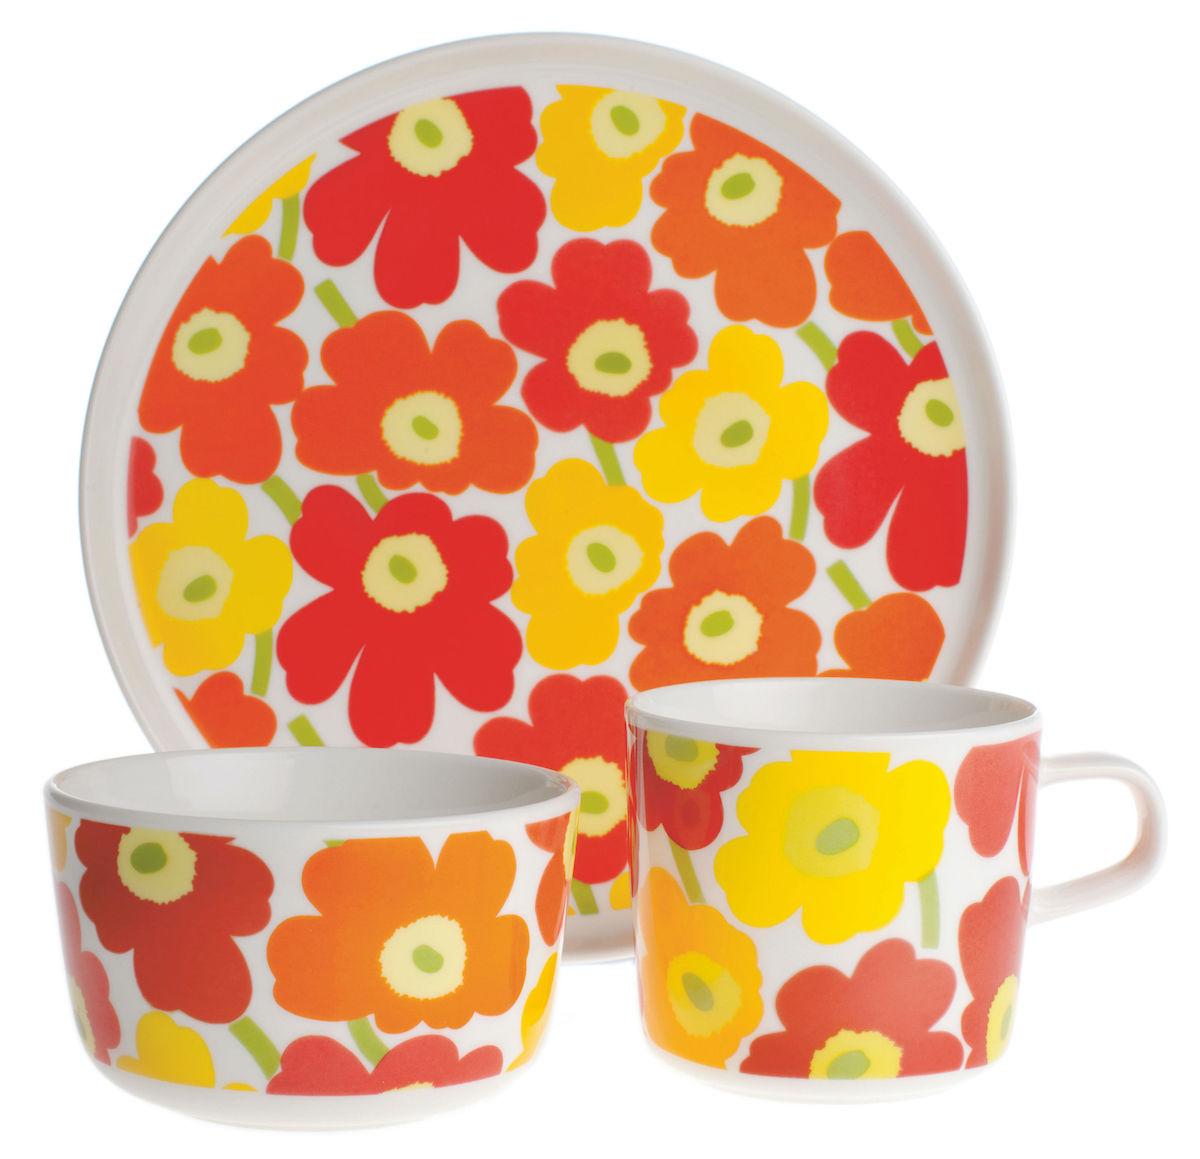 vaisselle Mini Unikko Marimekko motif fleur assiette jaune orange rouge